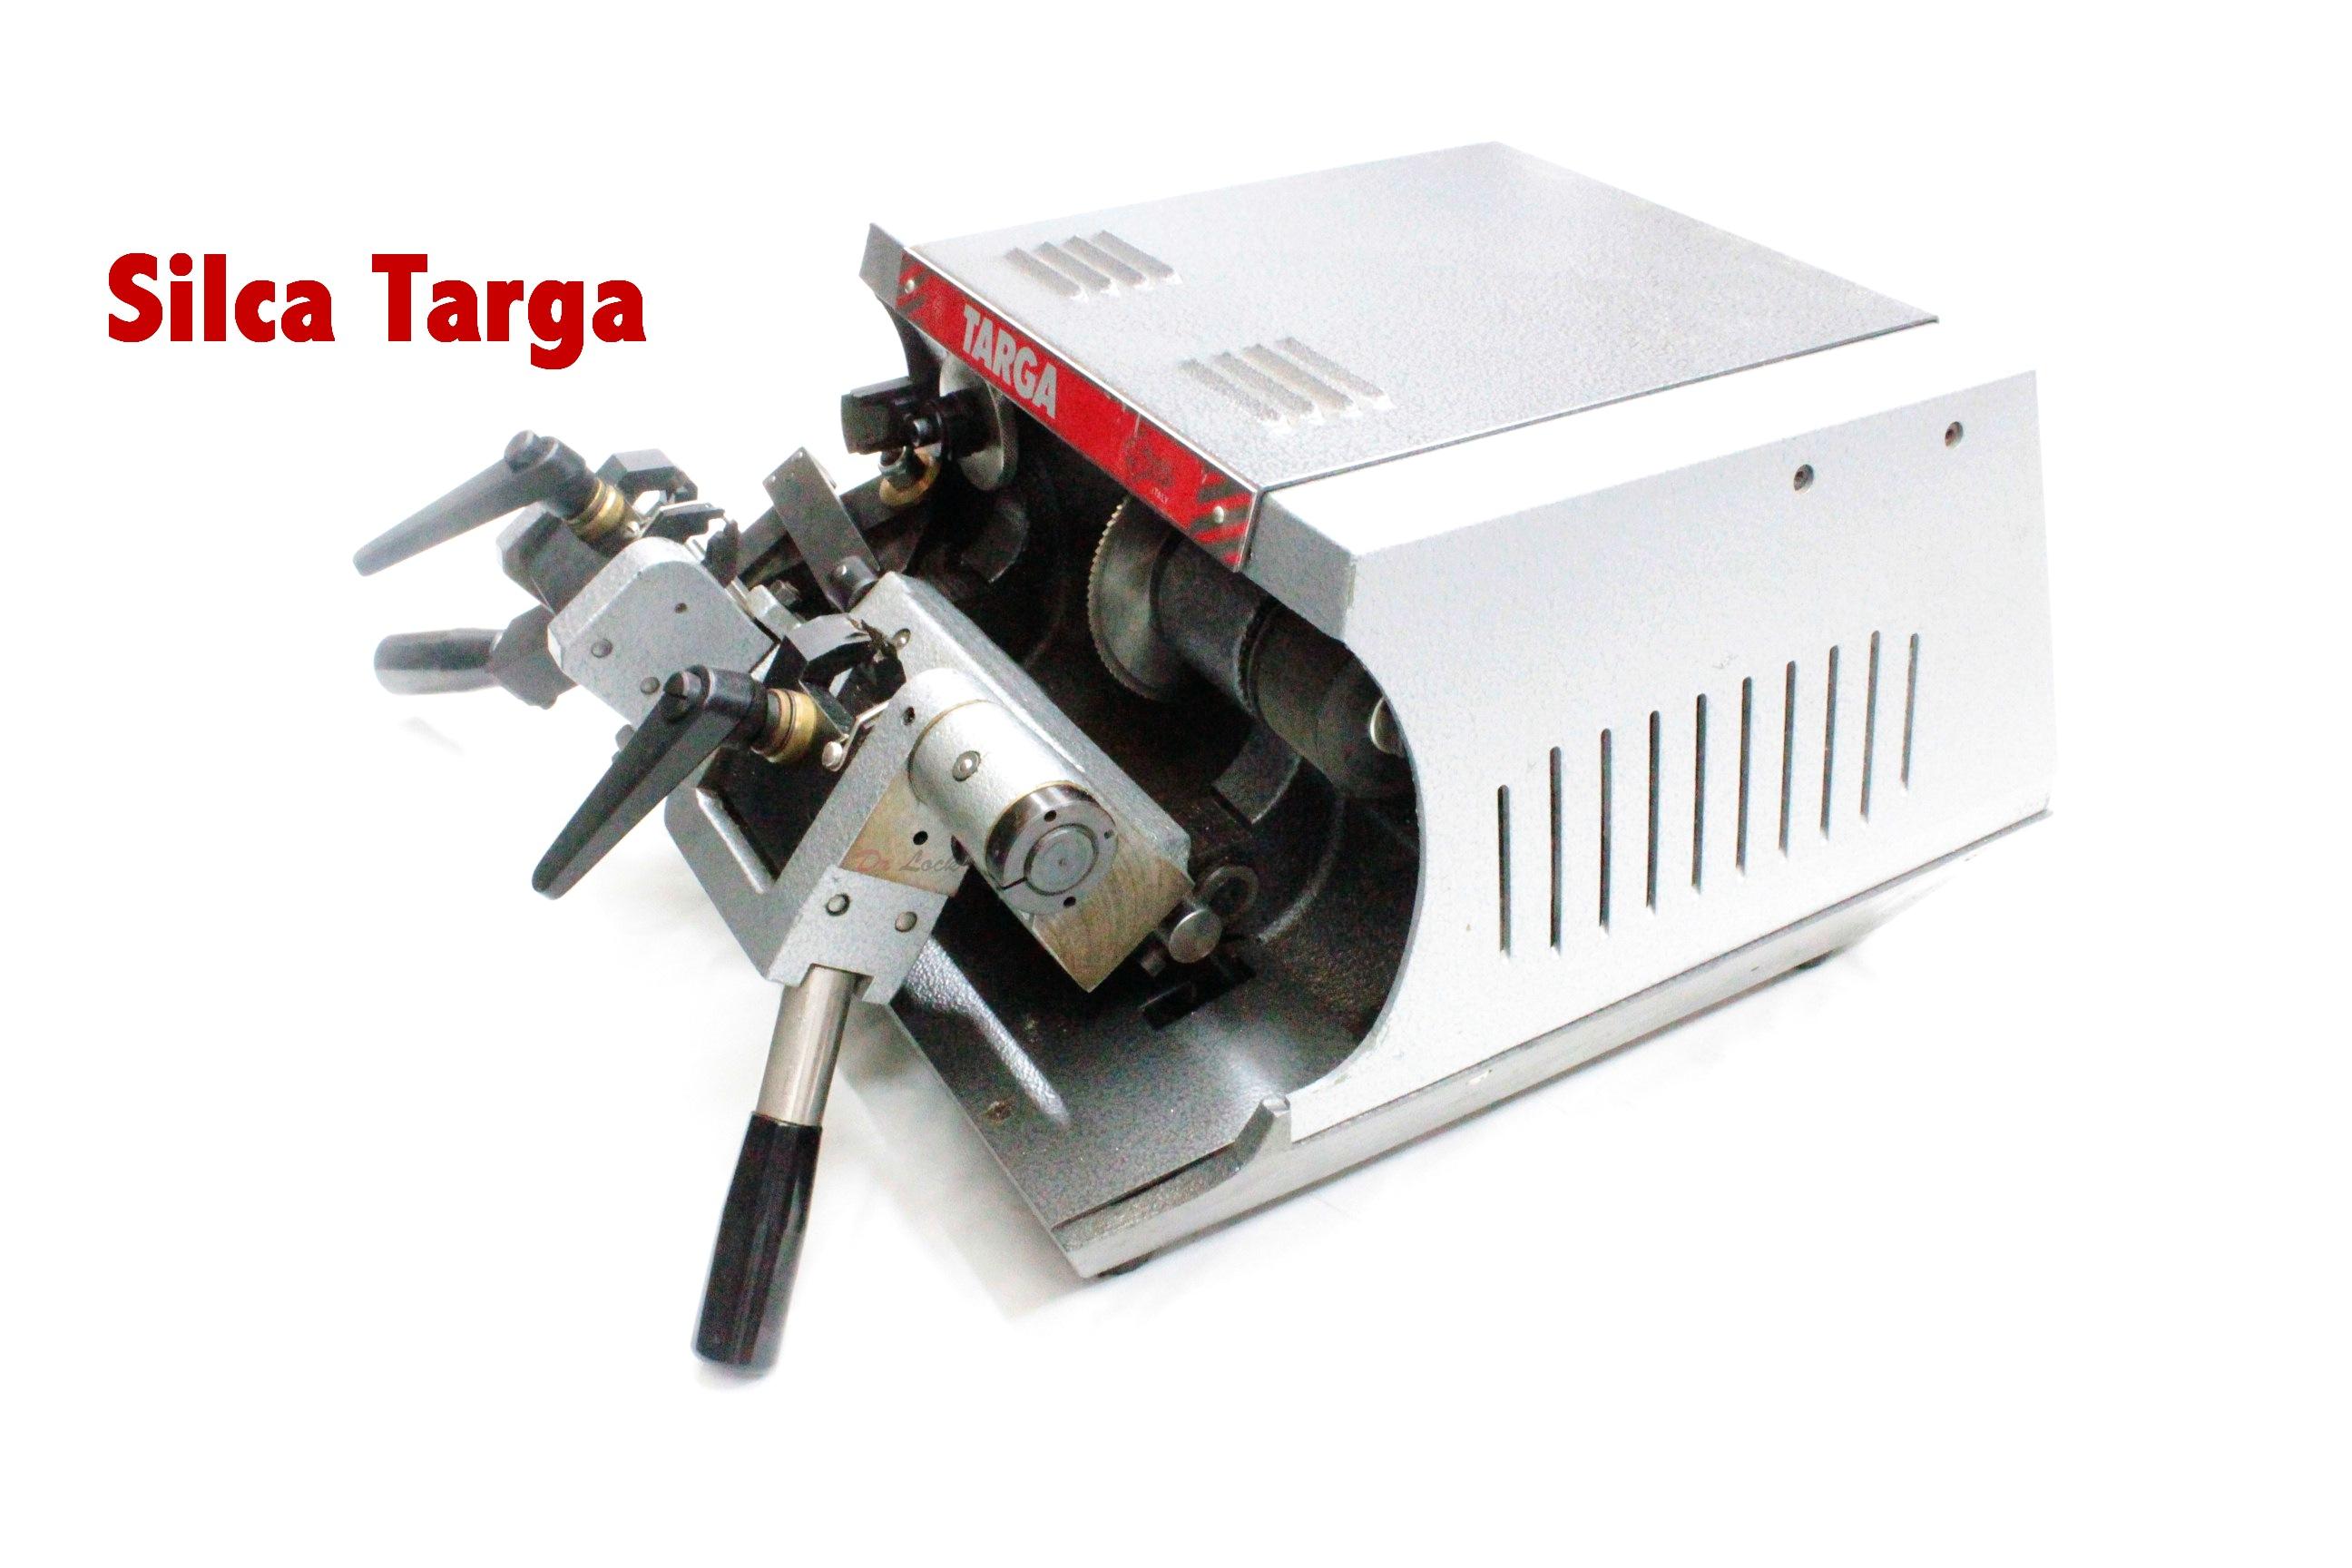 Silca Targa For Sale locksmith hpc lock shop